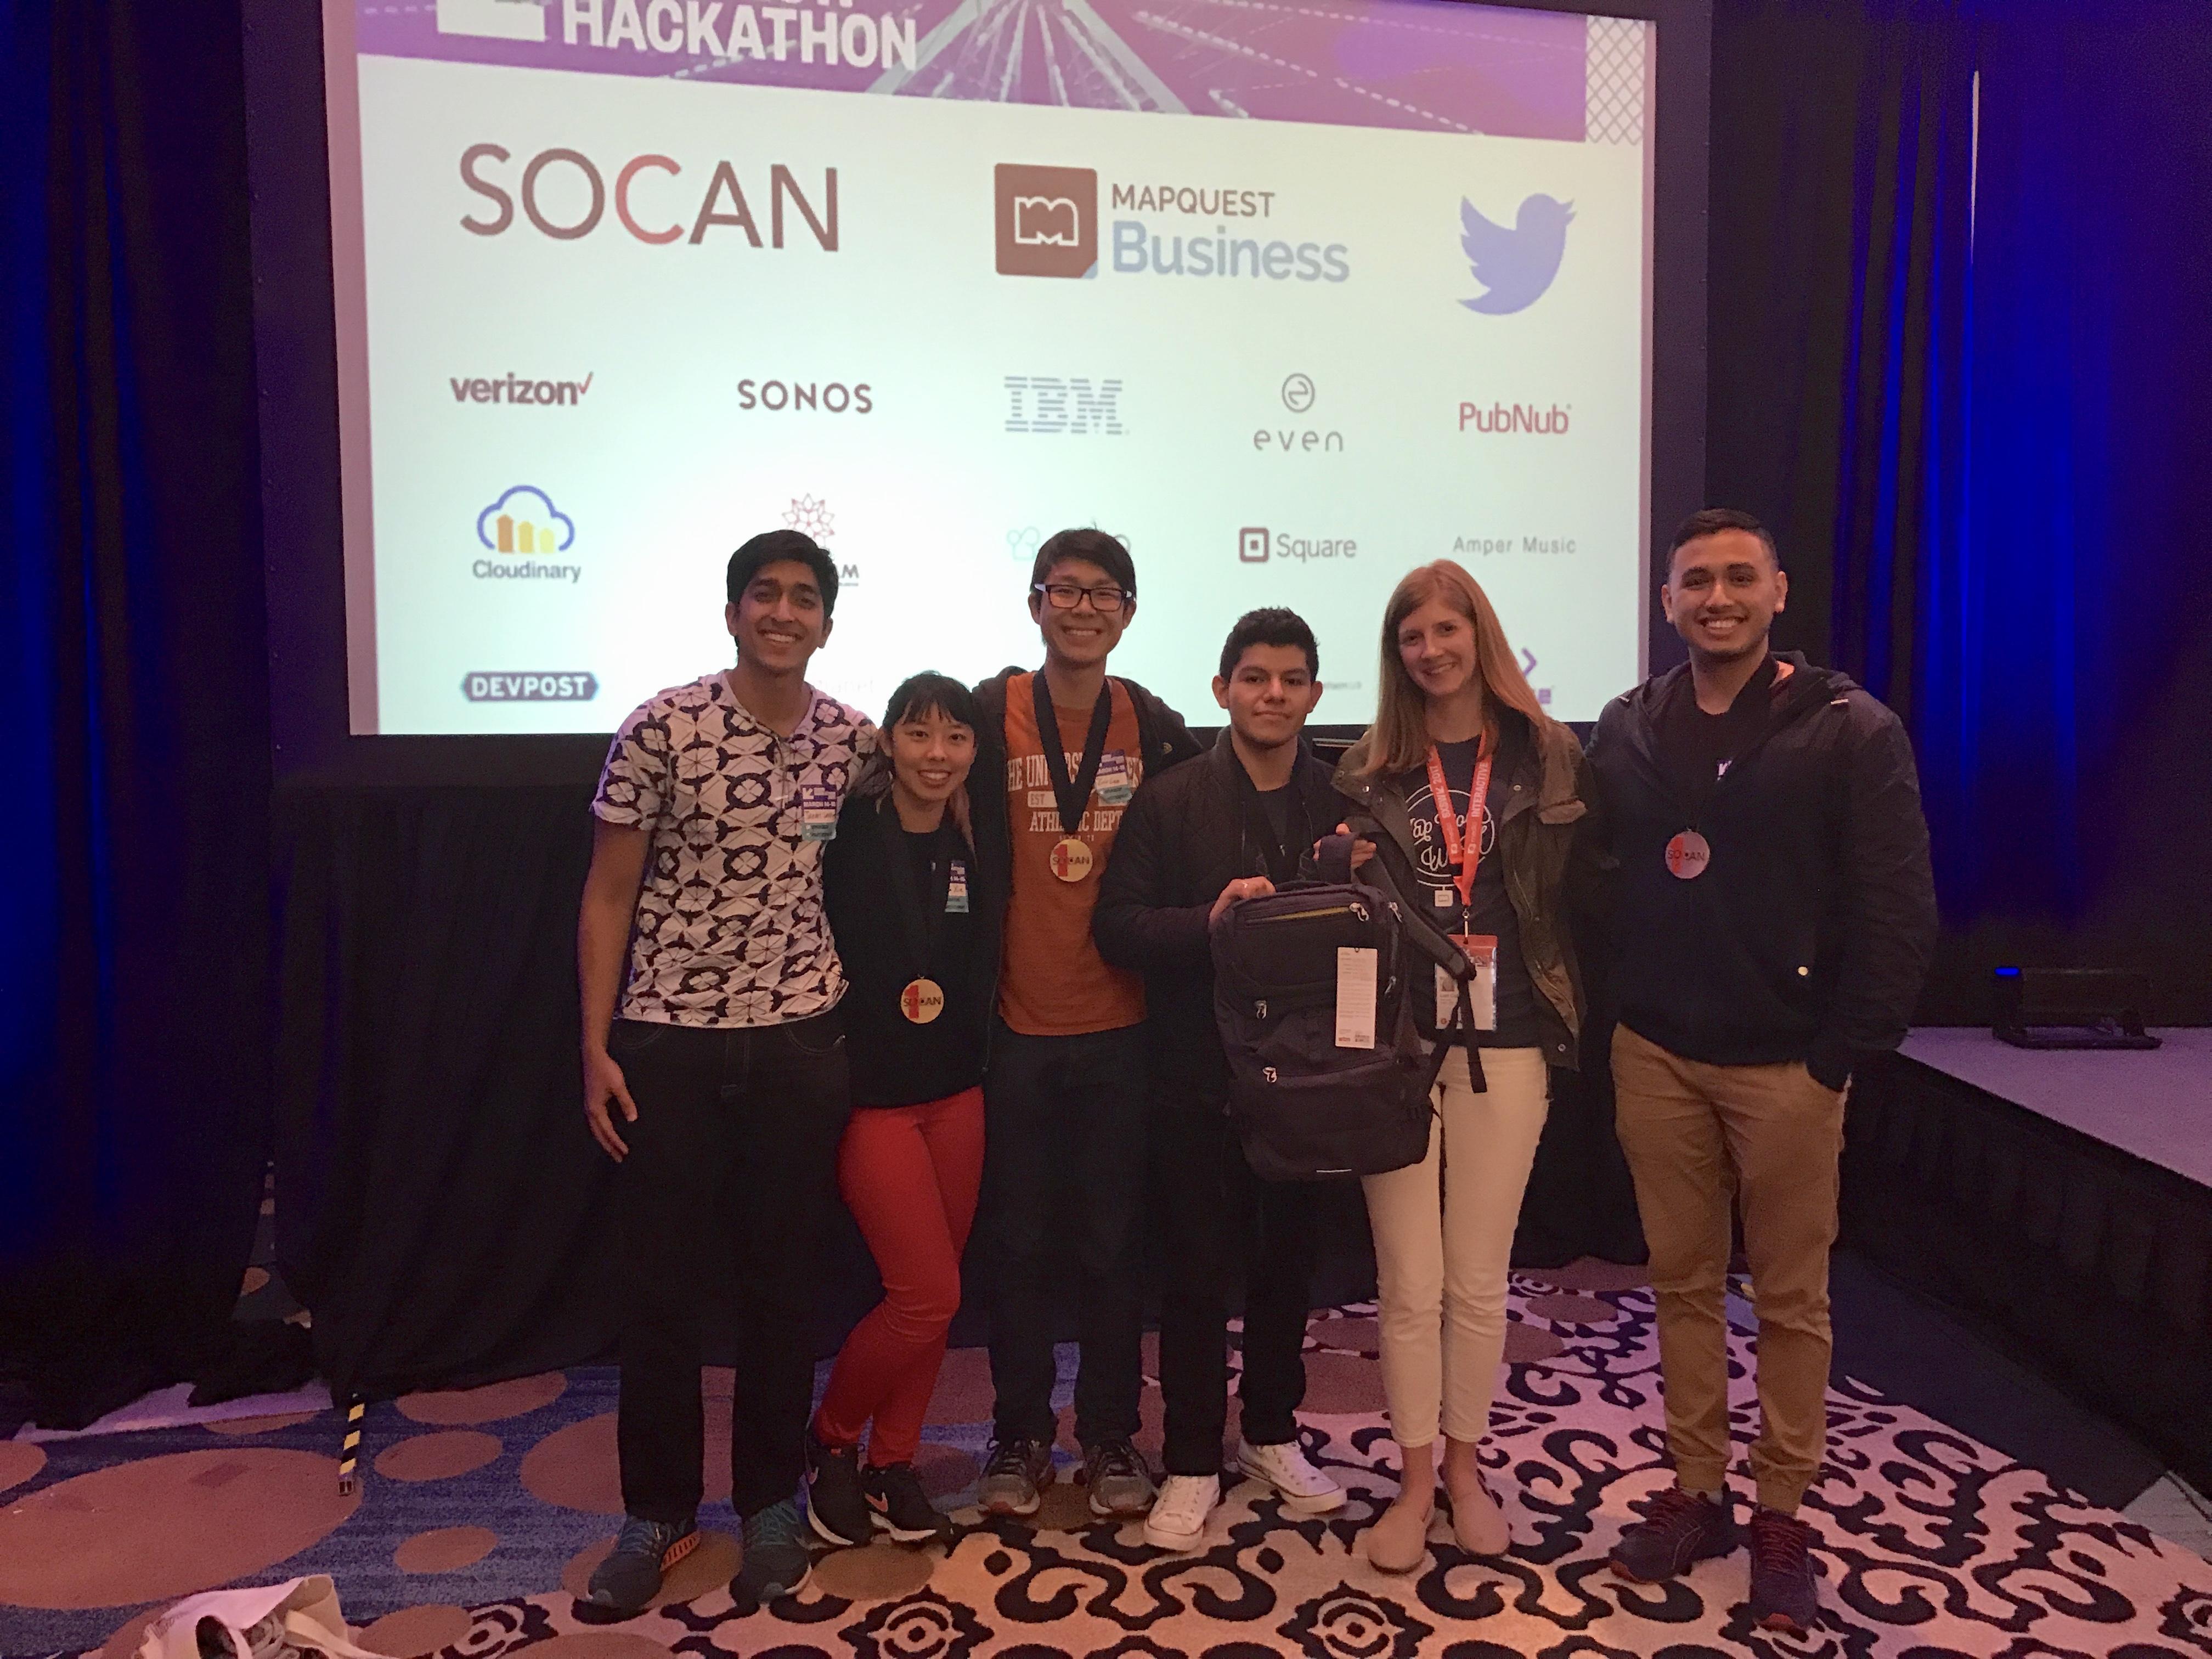 SXSW Hackathon